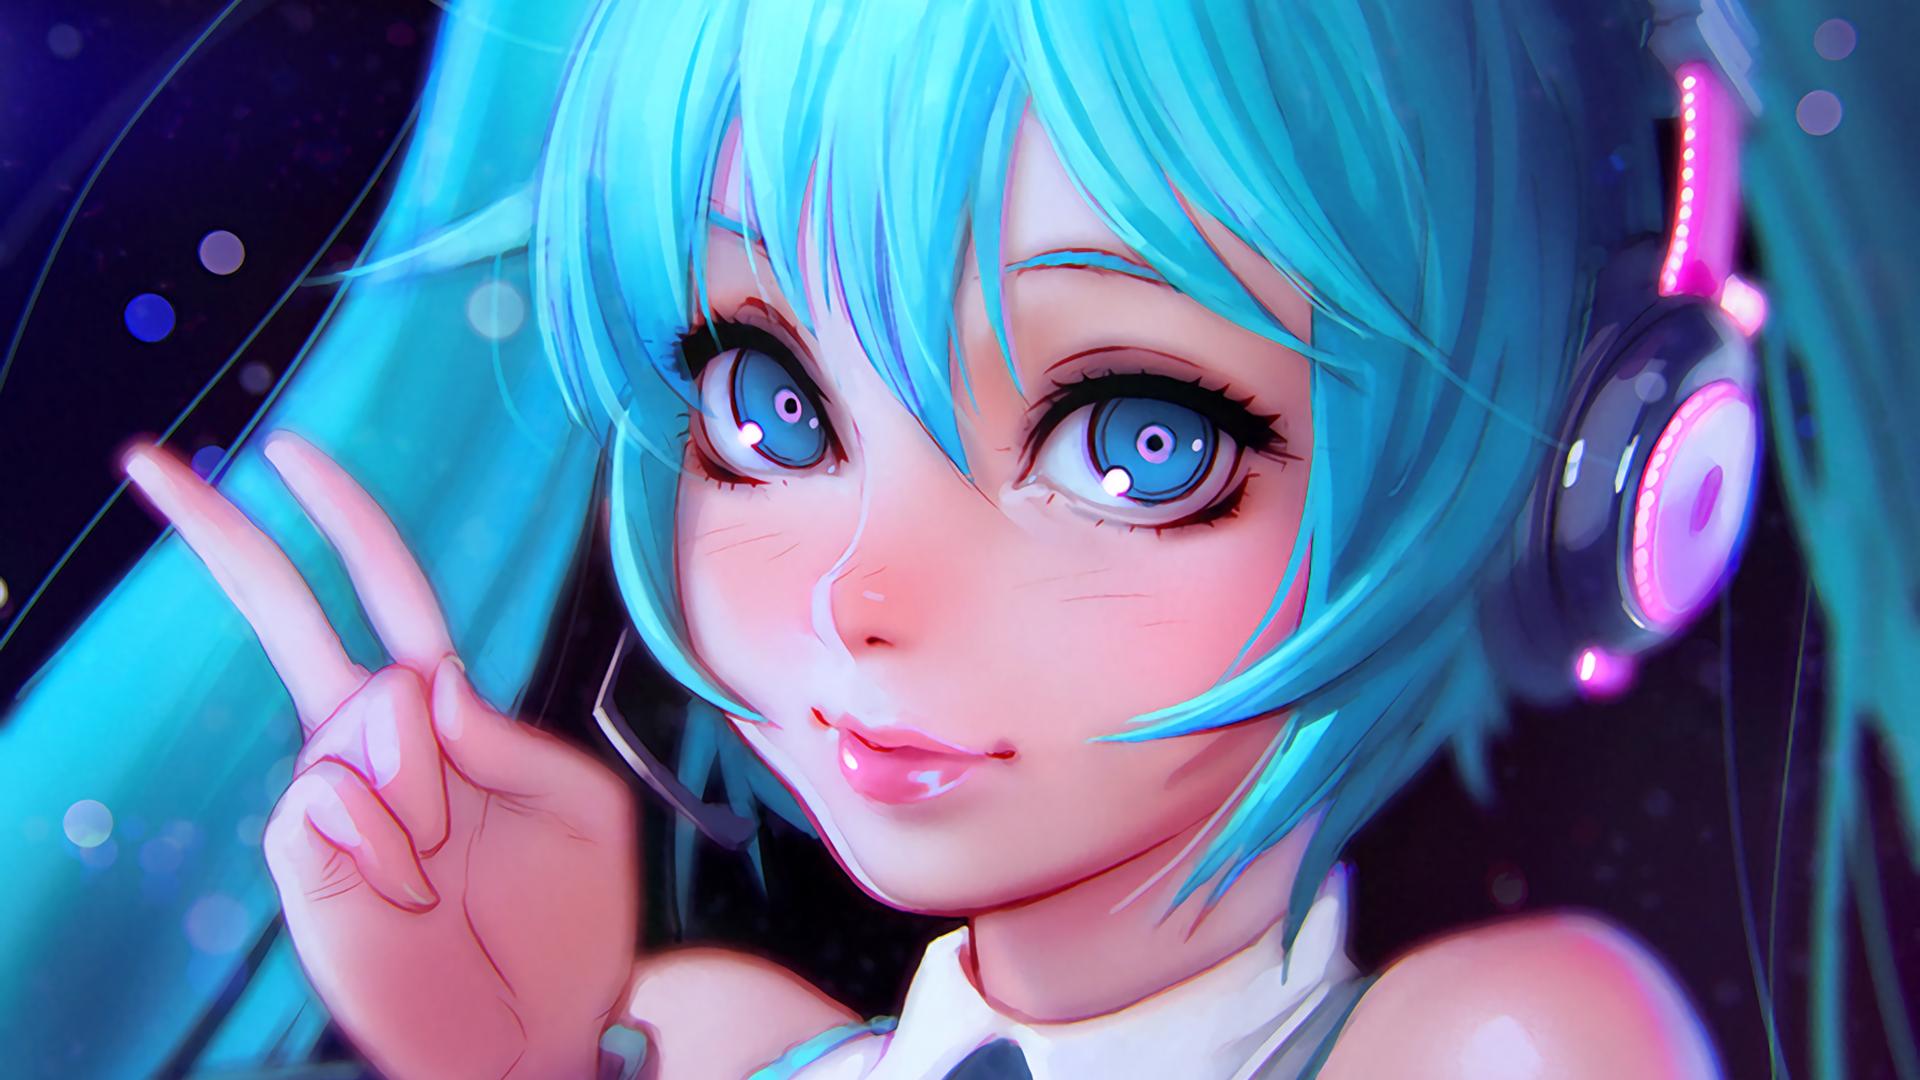 Vocaloid HD Wallpaper | Background Image | 1920x1080